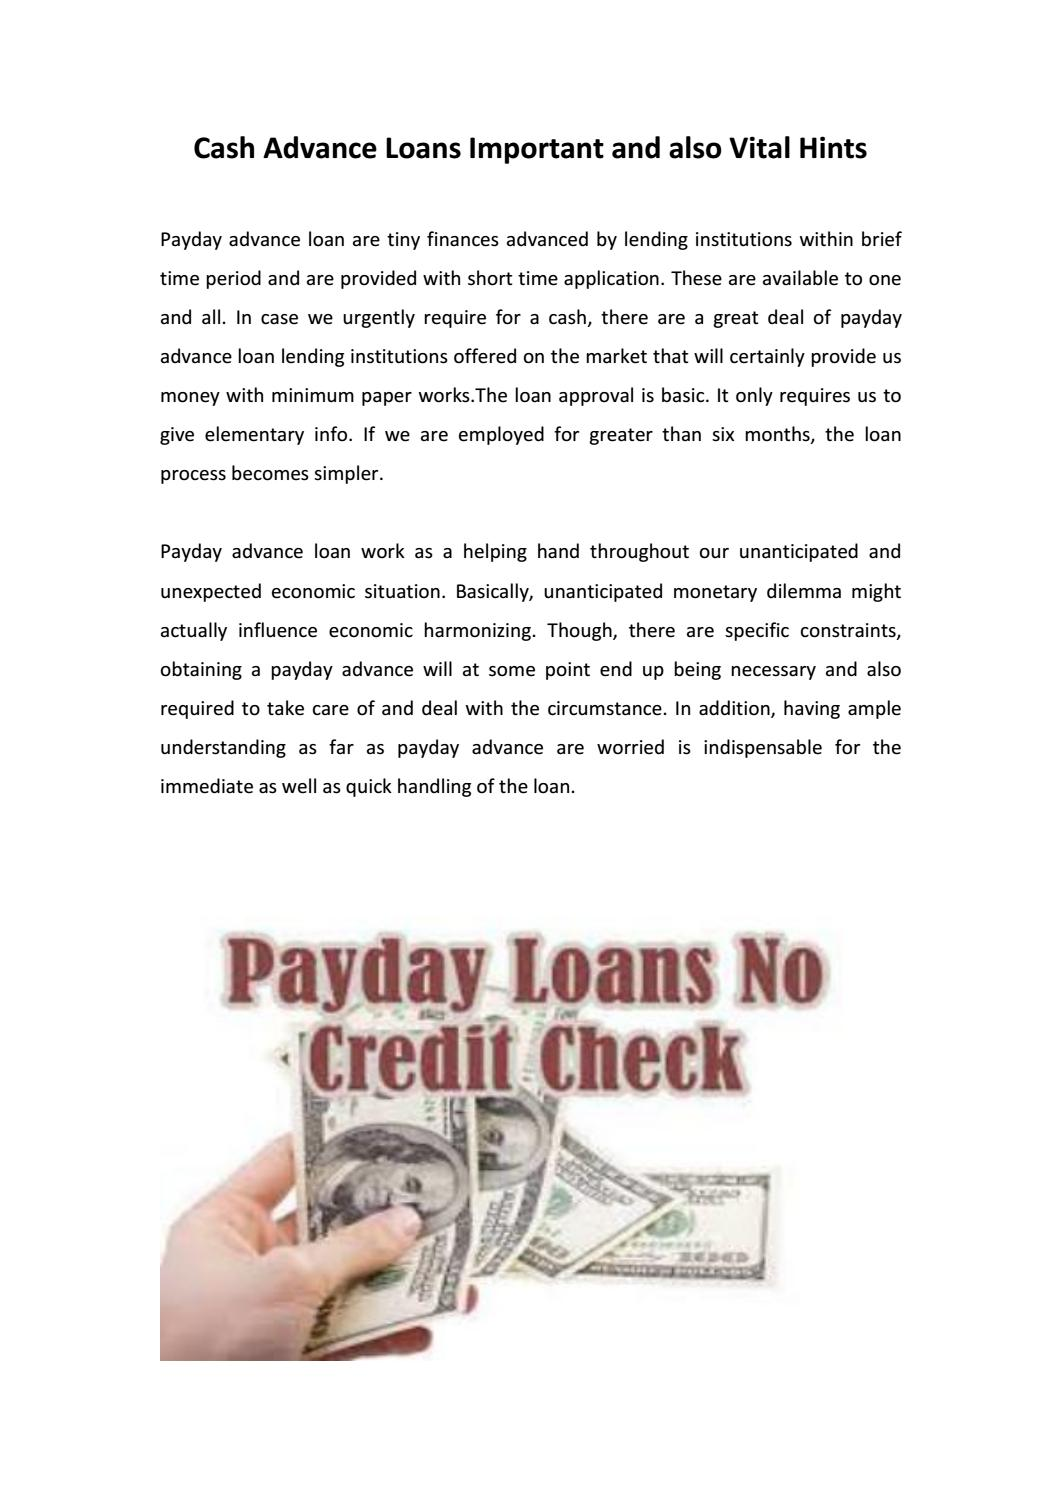 Cash Advance Loans >> Cash Advance Loans Important And Also Vital Hints By